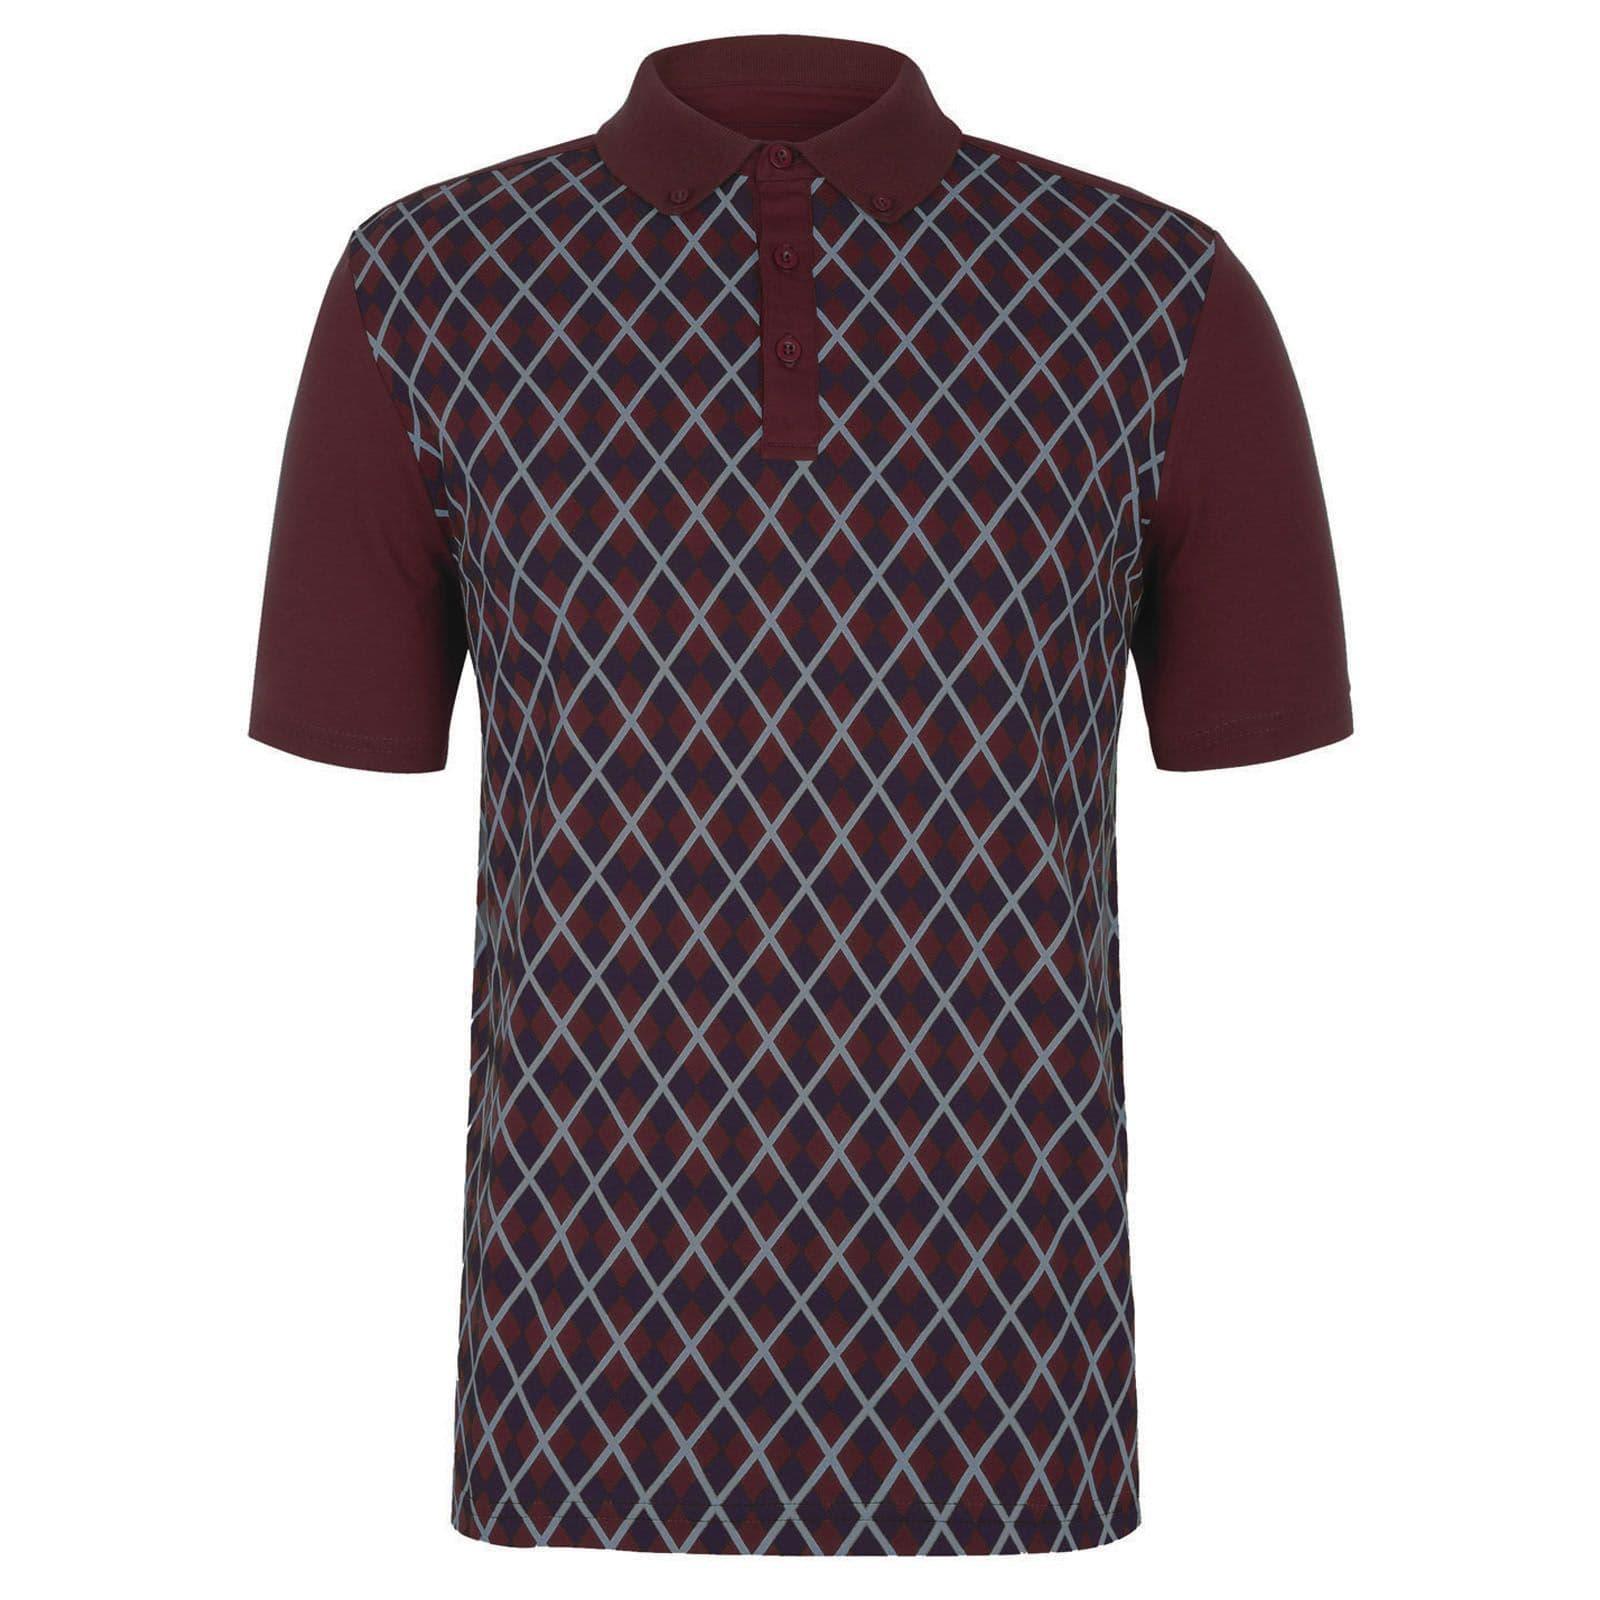 Рубашка Поло NiftyПоло под заказ<br><br><br>Артикул: 1913209<br>Материал: 100% хлопок<br>Цвет: бургунди<br>Пол: Мужской